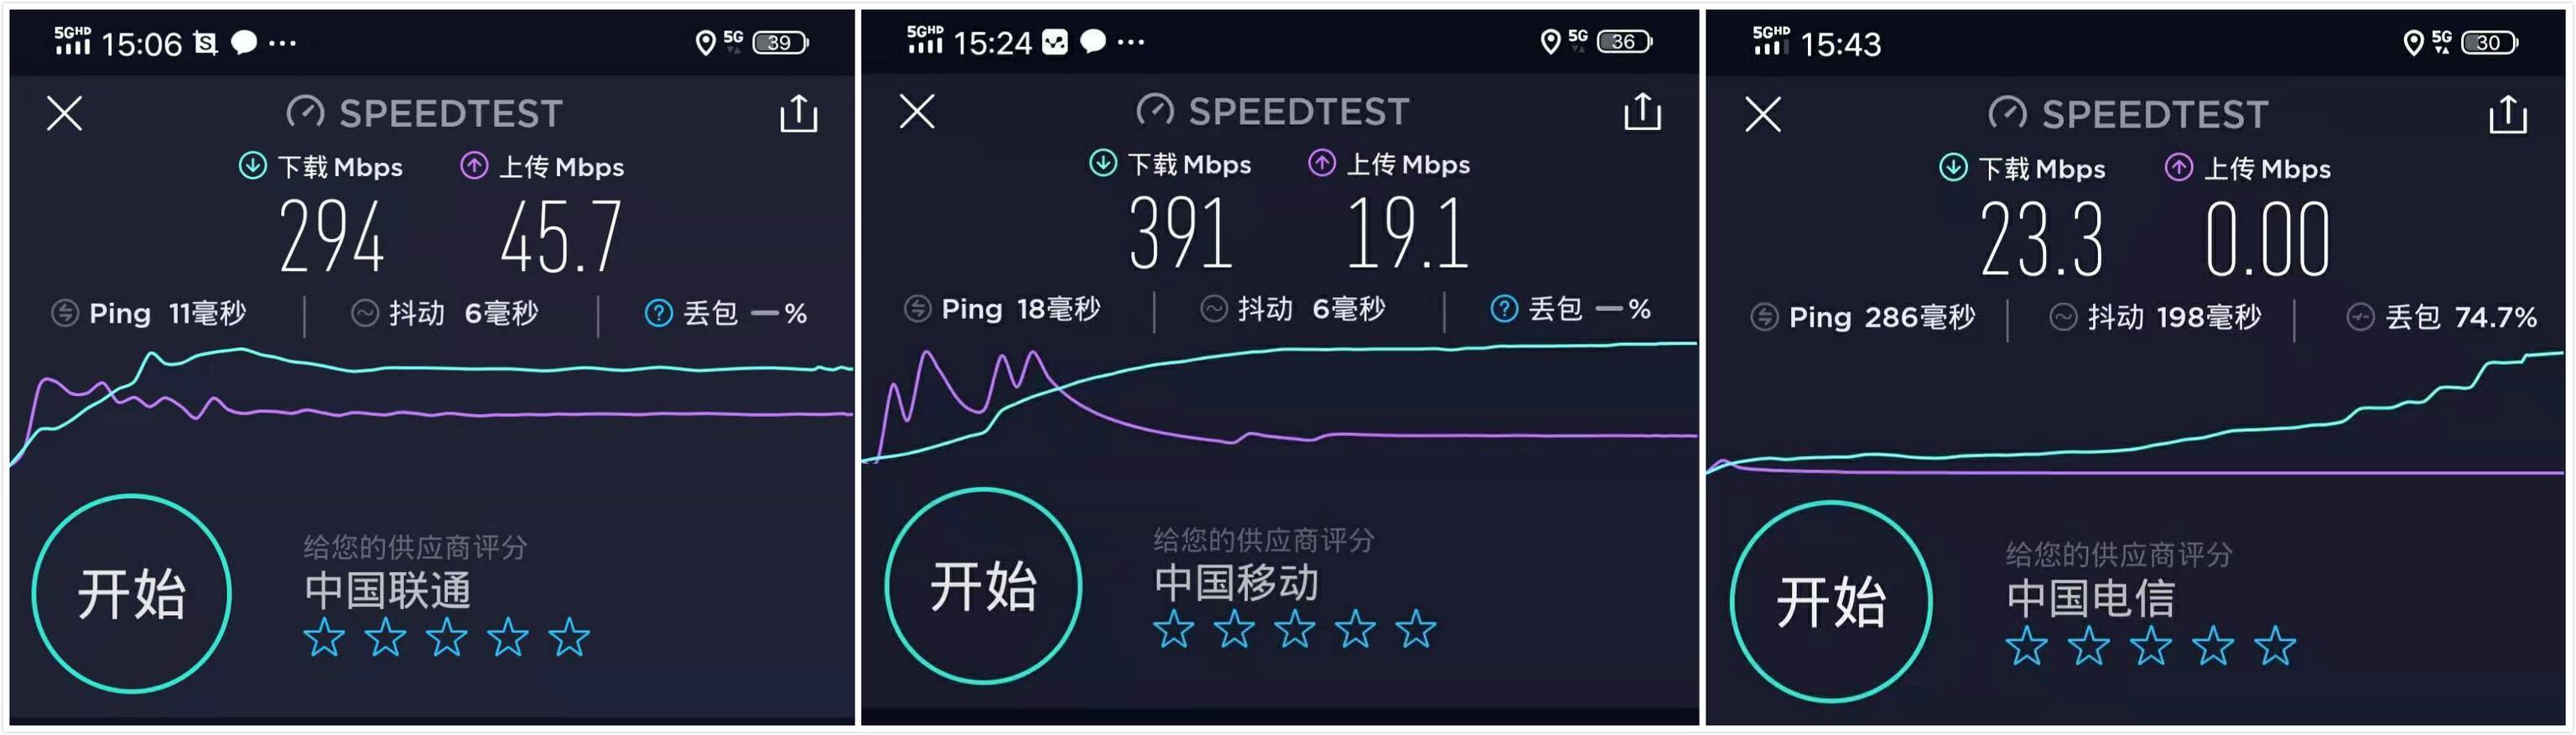 5G手机究竟值得买不?终极答案来了